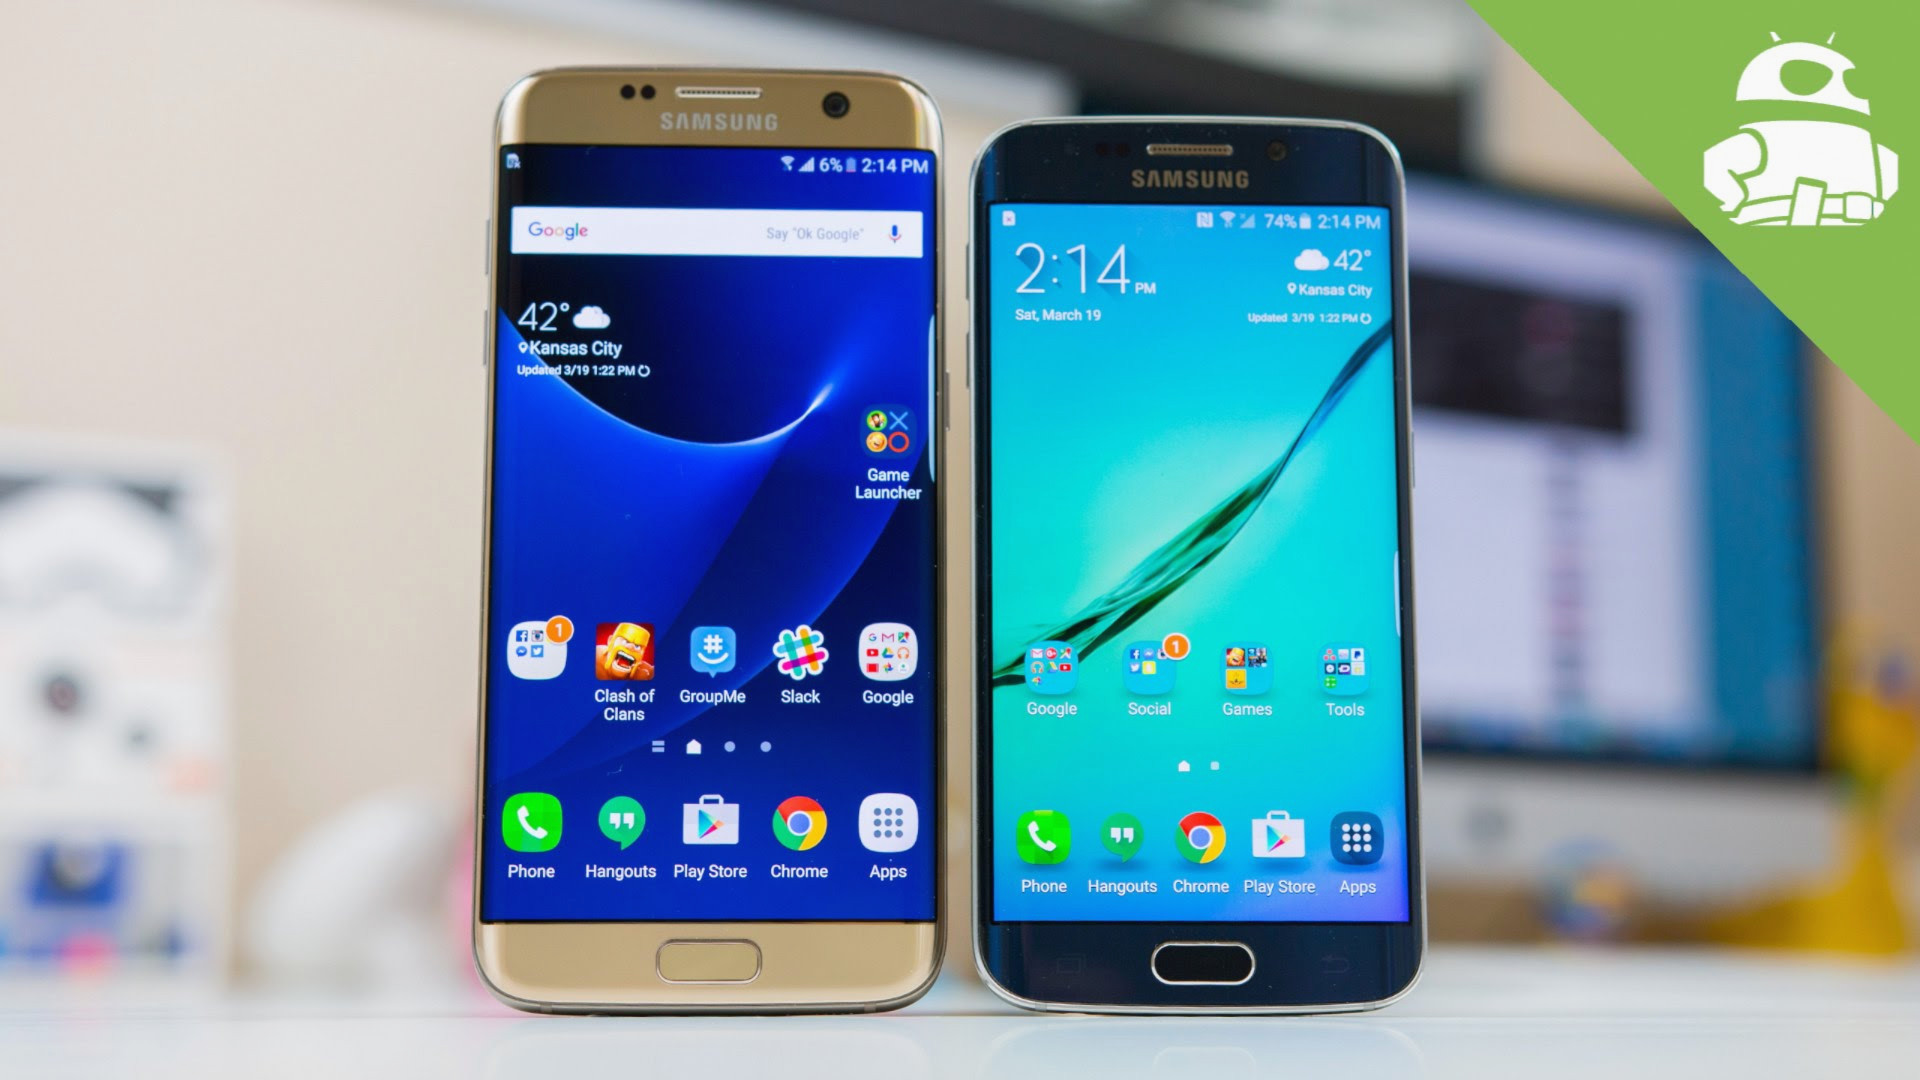 Samsung S7 Edge Wallpaper - Galaxy S 7 Edge , HD Wallpaper & Backgrounds